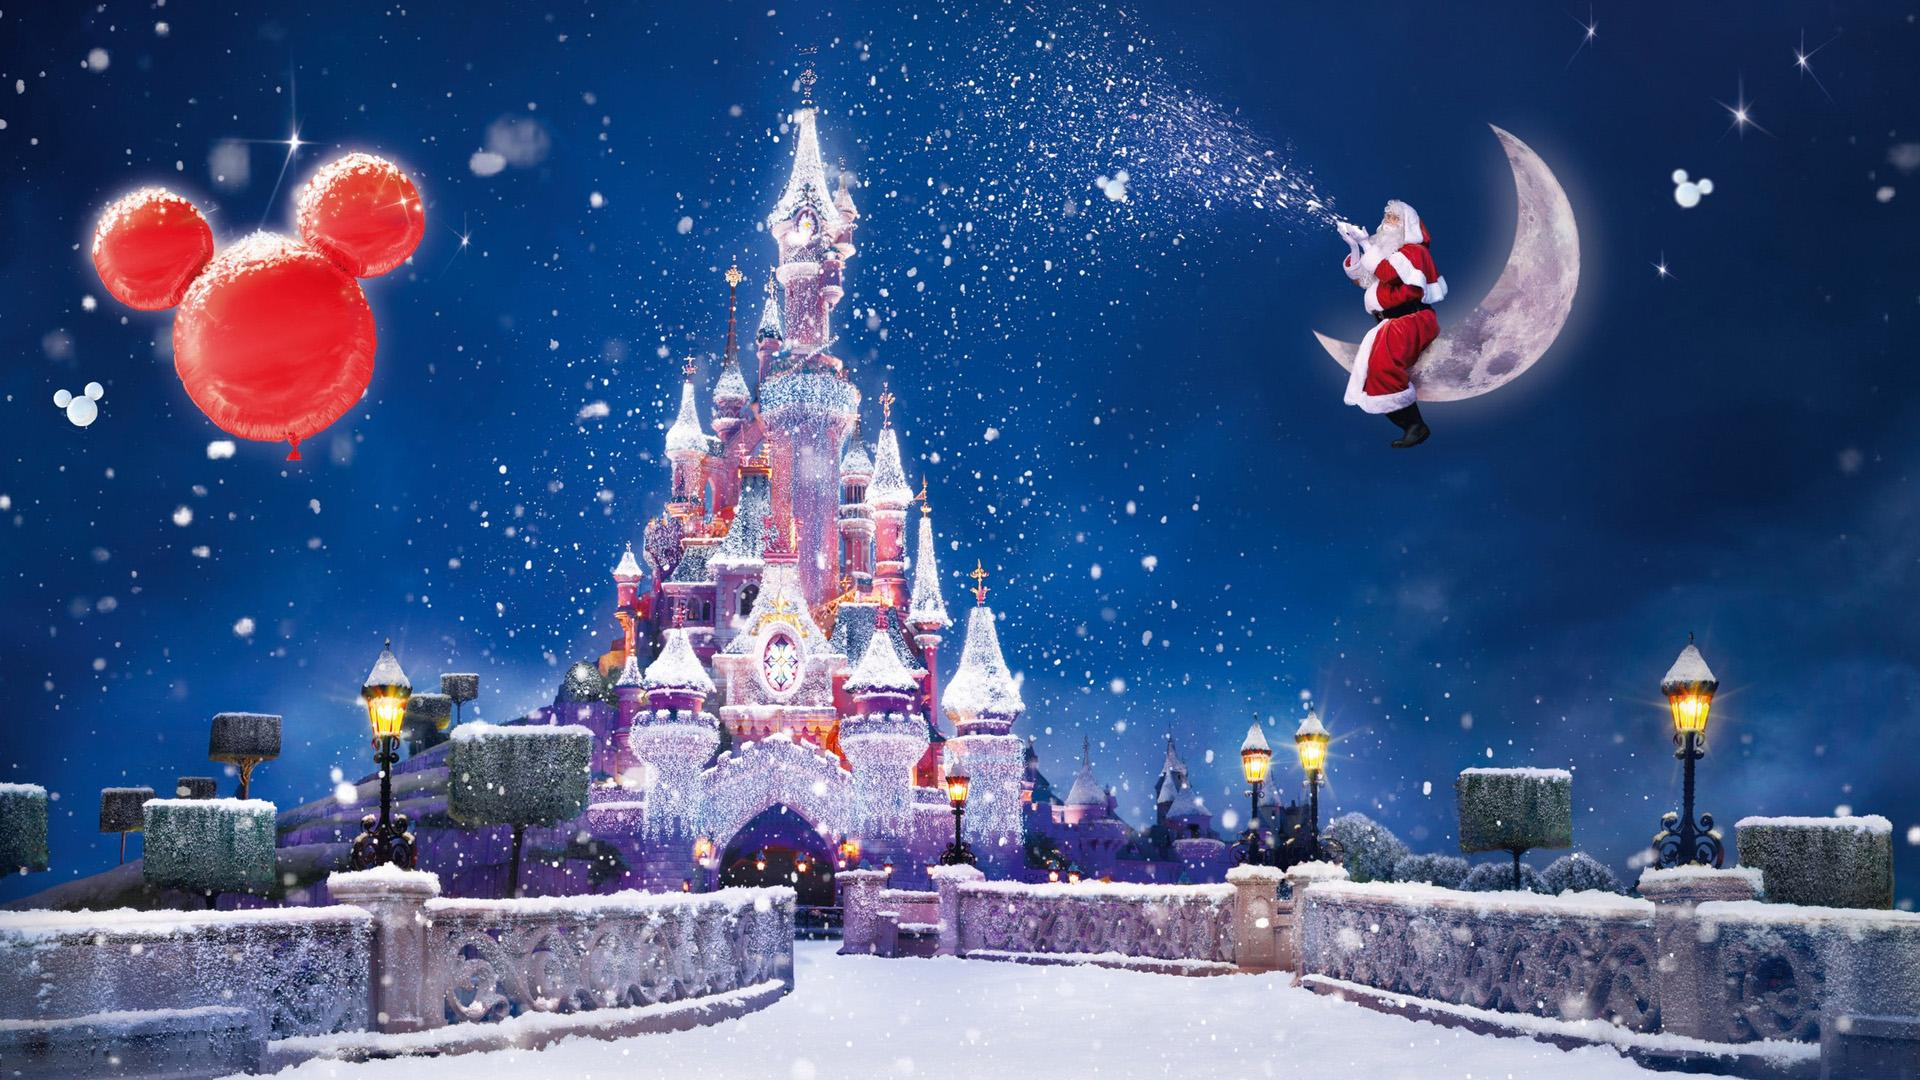 Nativity Widescreen Hd Wallpapers Top Free Nativity Widescreen Hd Backgrounds Wallpaperaccess